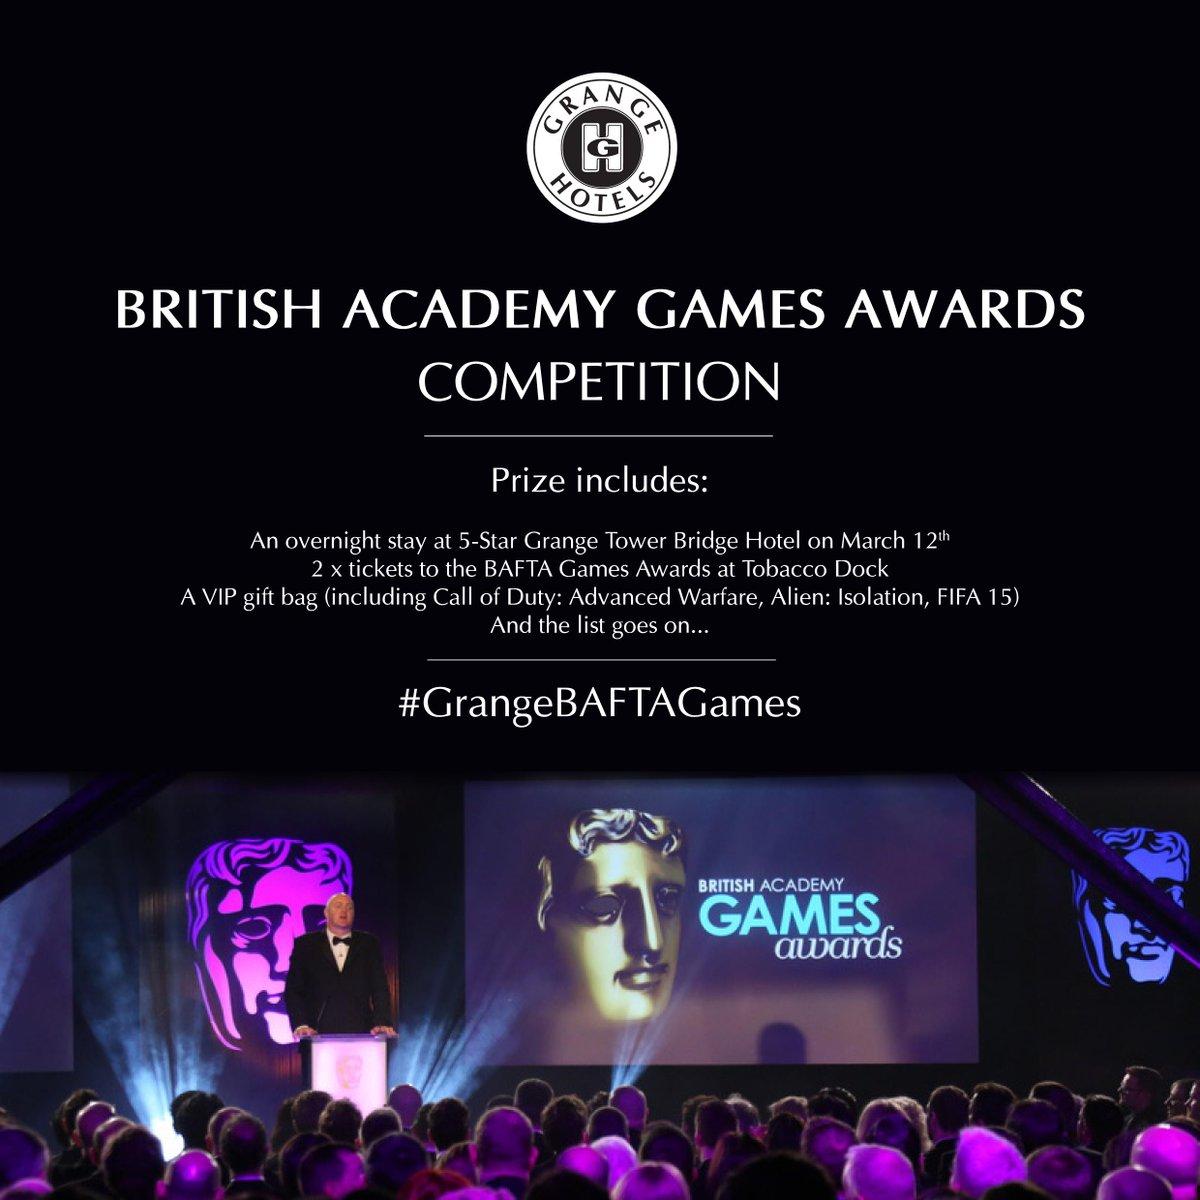 BAFTA Games Competition! RT & Follow for a chance to WIN BIG #GrangeBAFTAGames #ProudPartner  http://t.co/uXM6E8vLMX http://t.co/jQLuQBpoBw